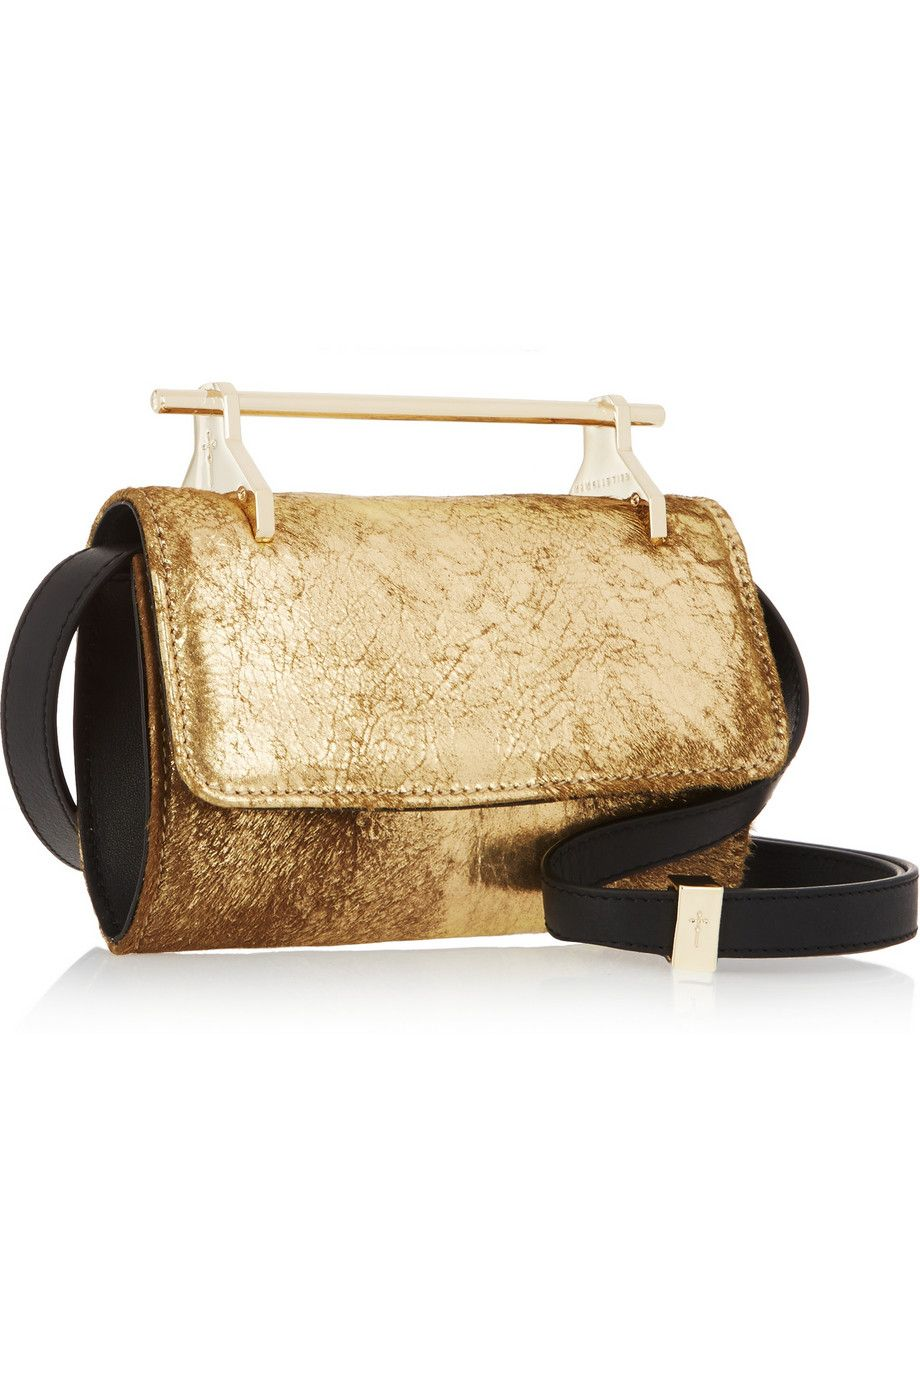 M2malletier HANDBAGS - Handbags su YOOX.COM LN0RmGC